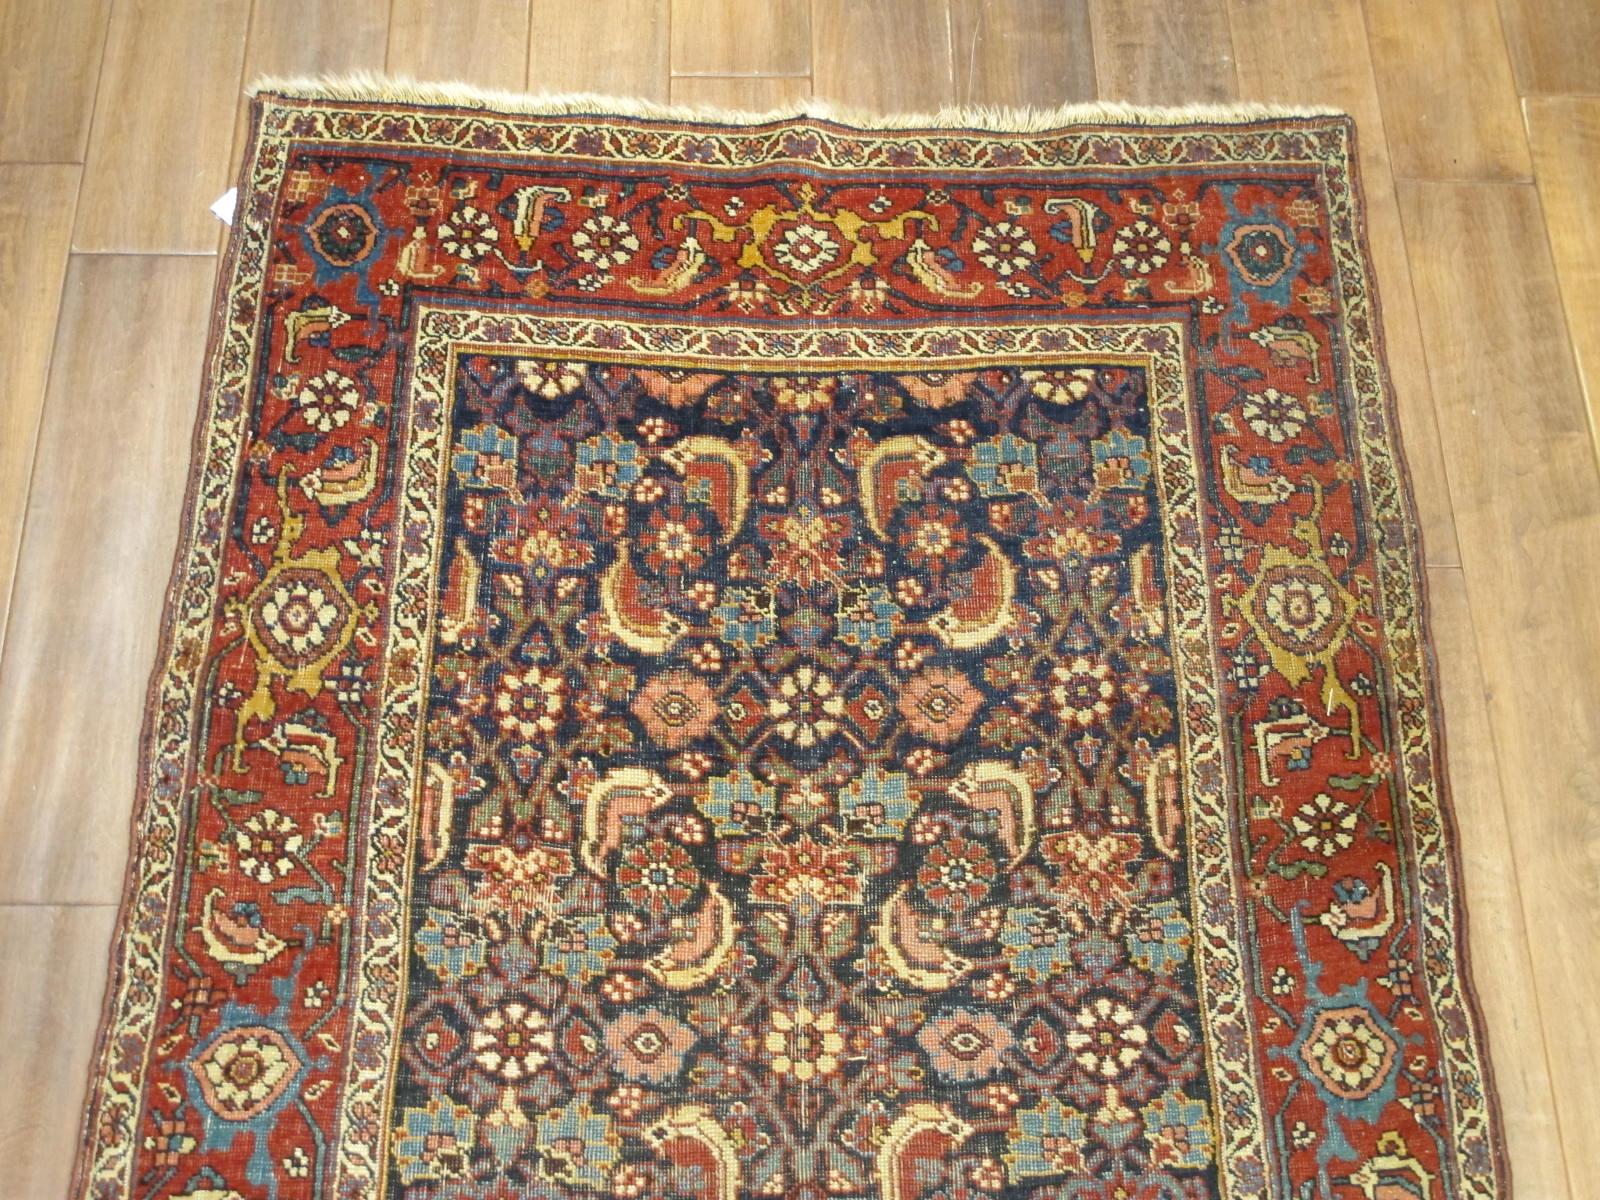 13078 antique persian bidjar runner 3,6x13,4 (3)